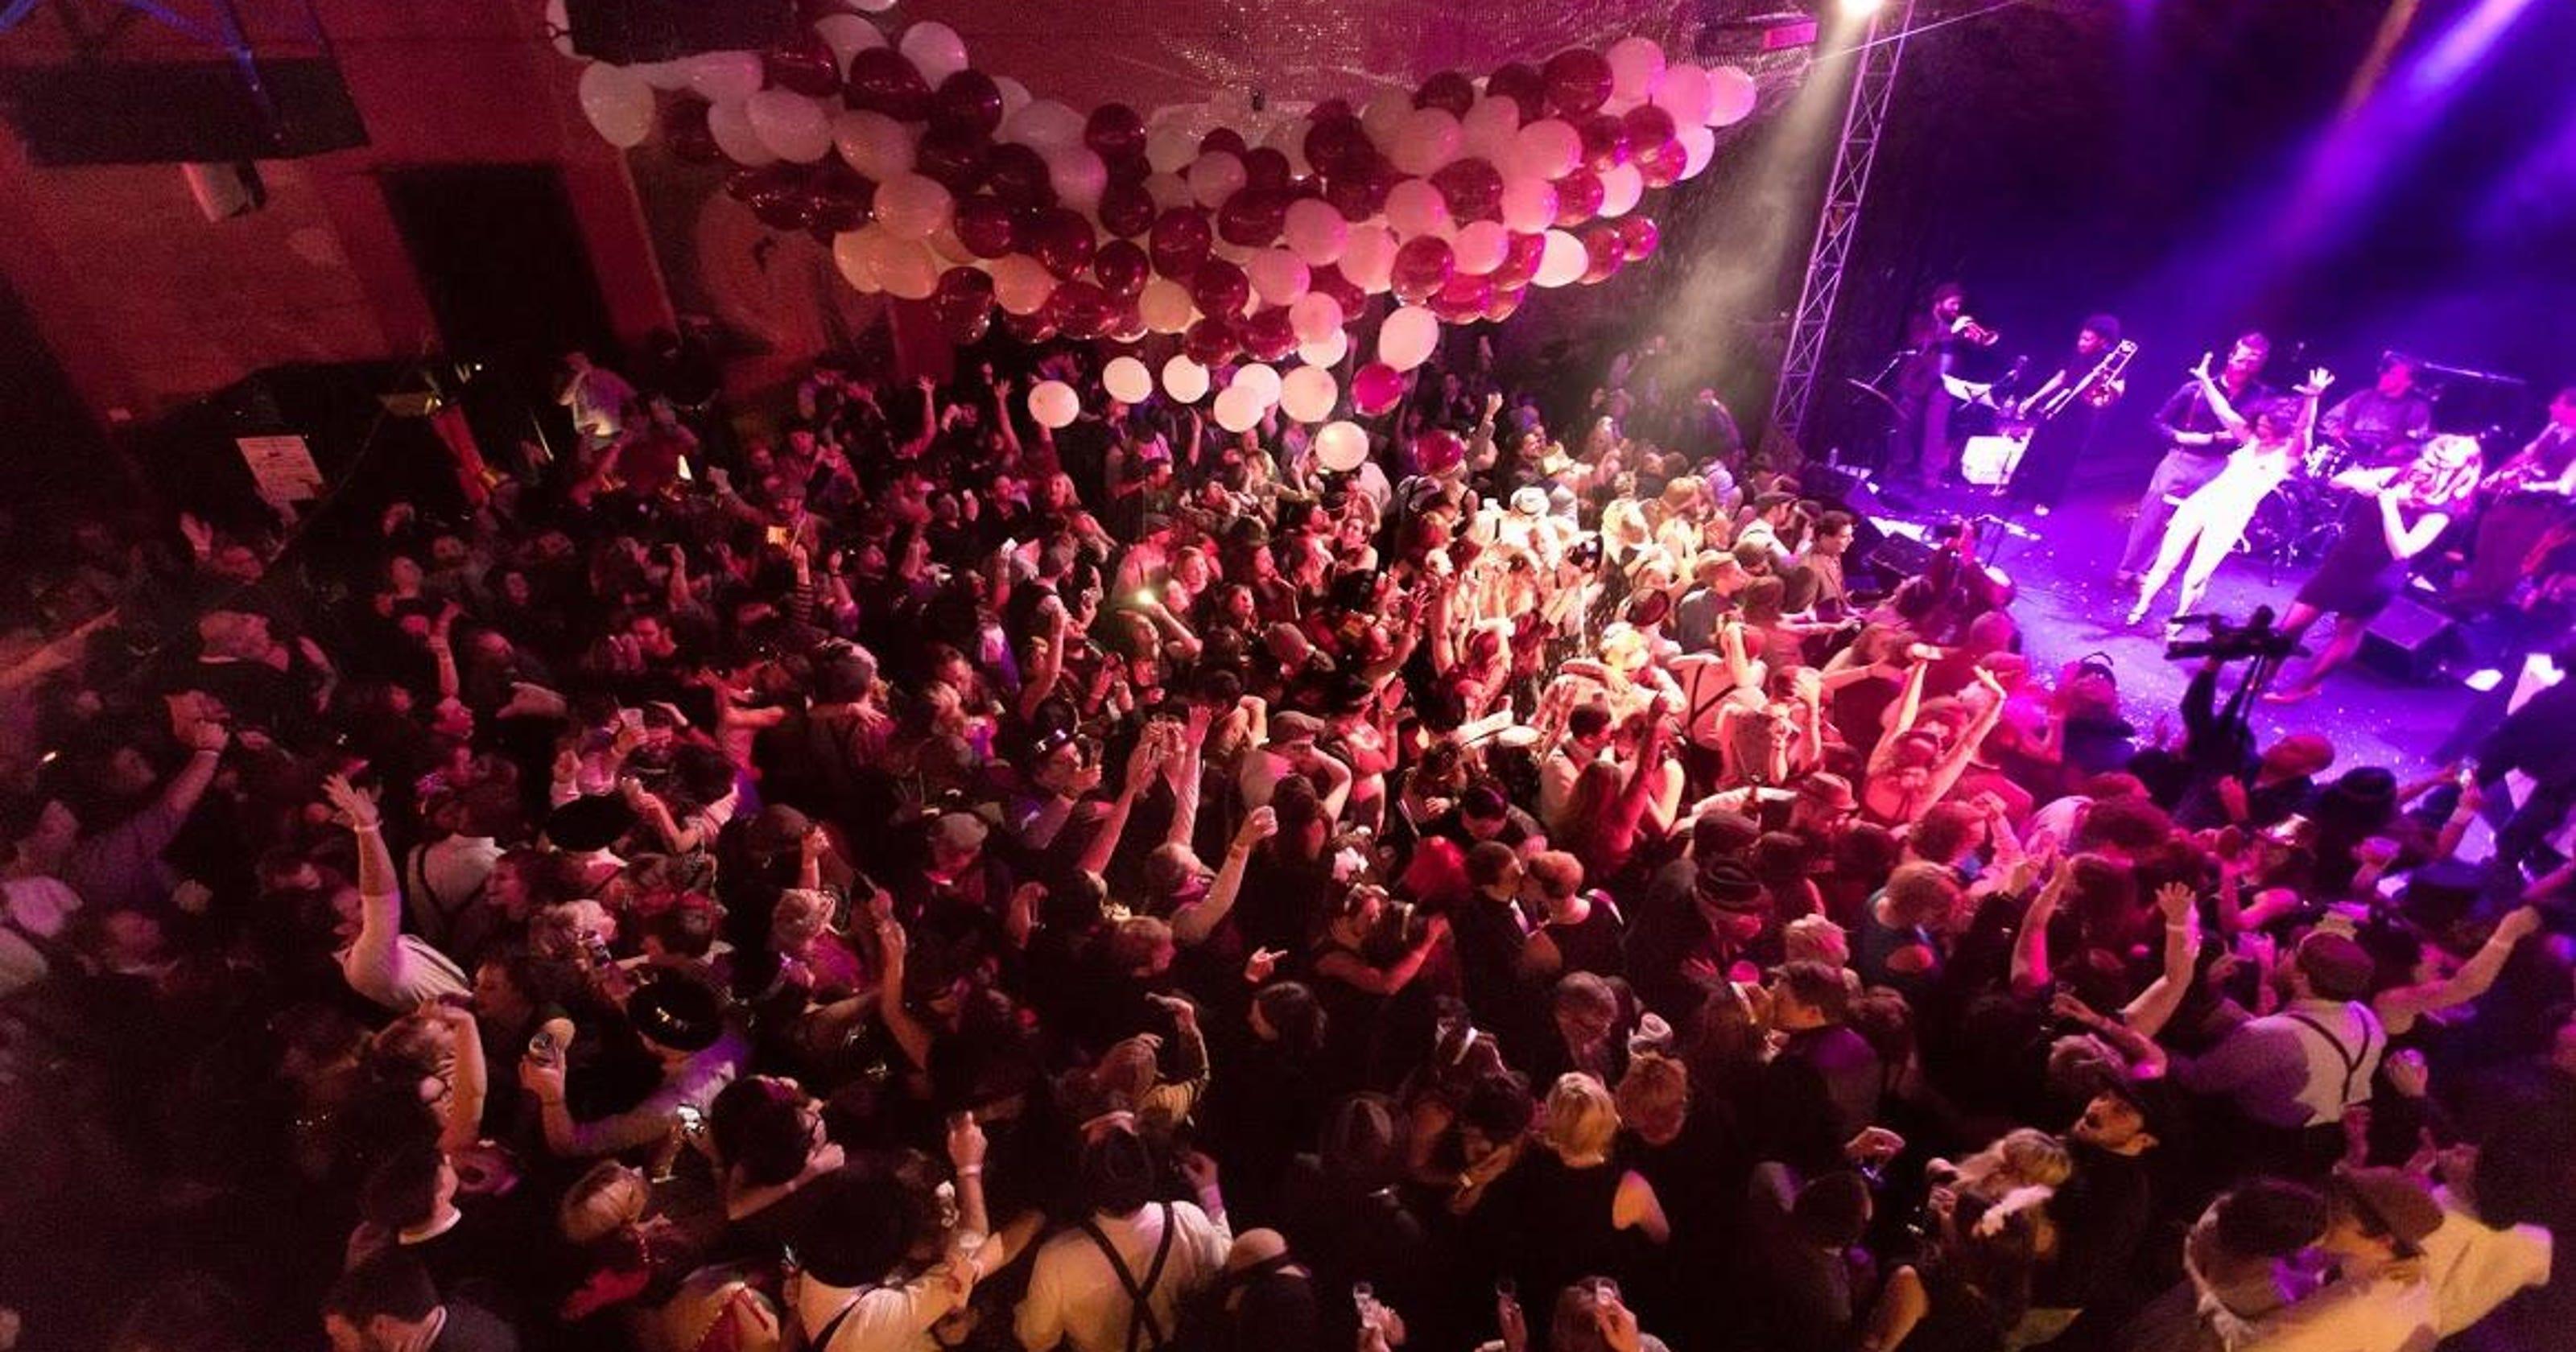 Louisville's Headliners Music Hall celebrates 20 years